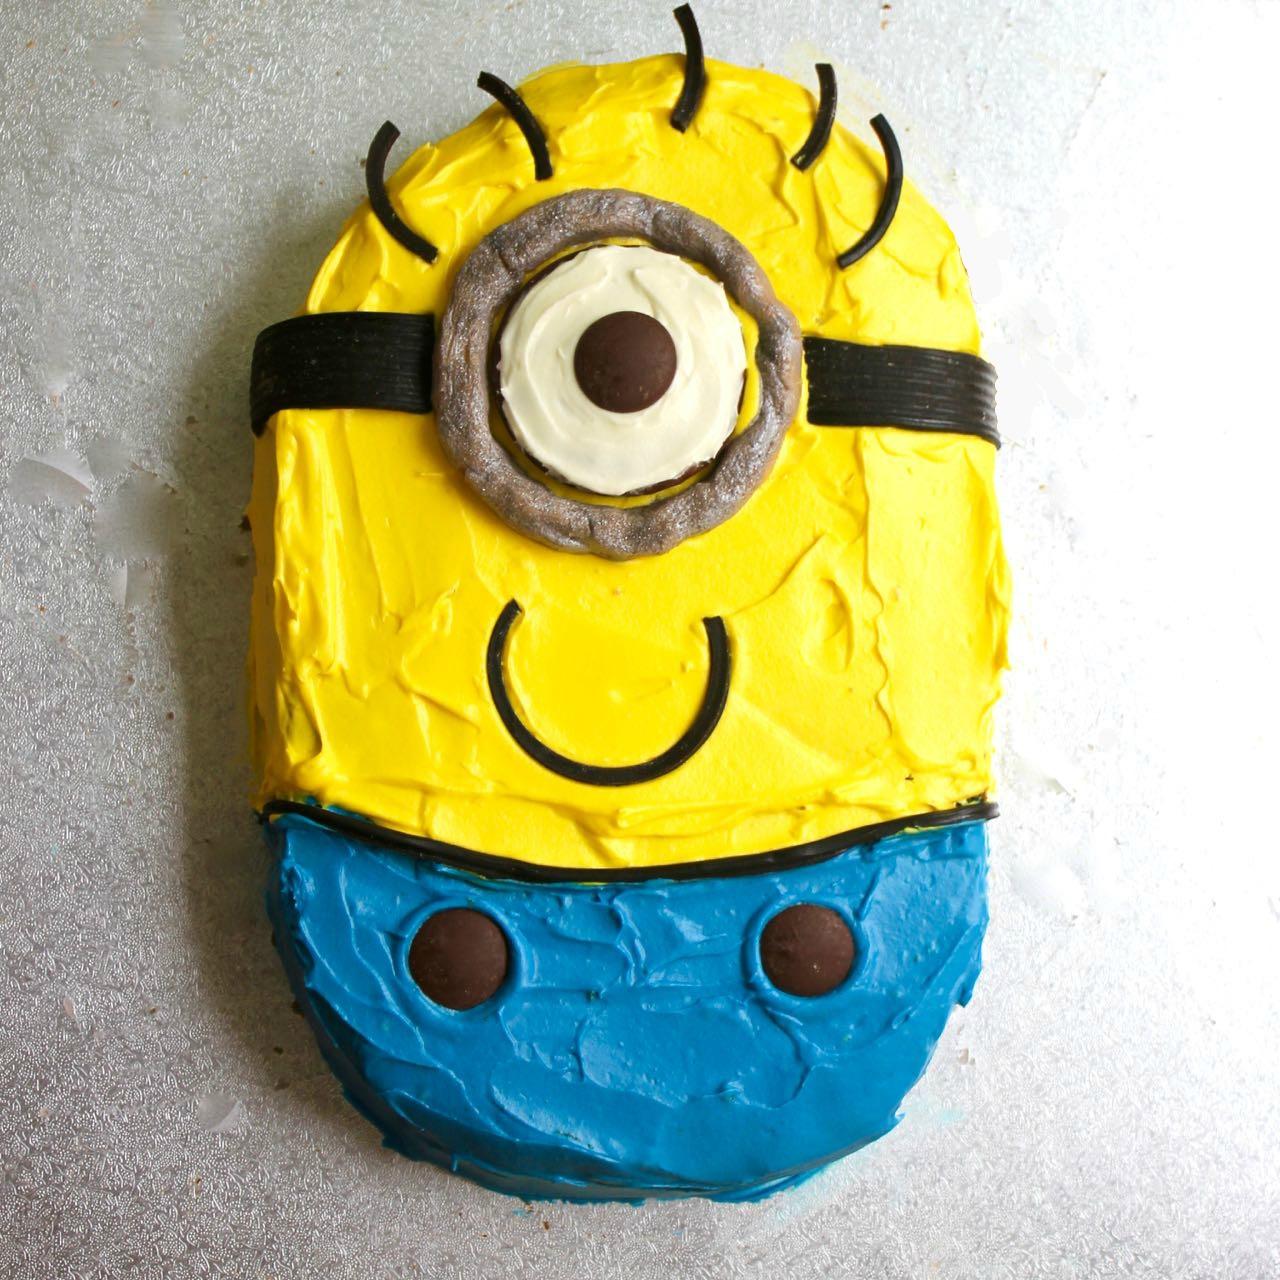 Making A Minion Cake